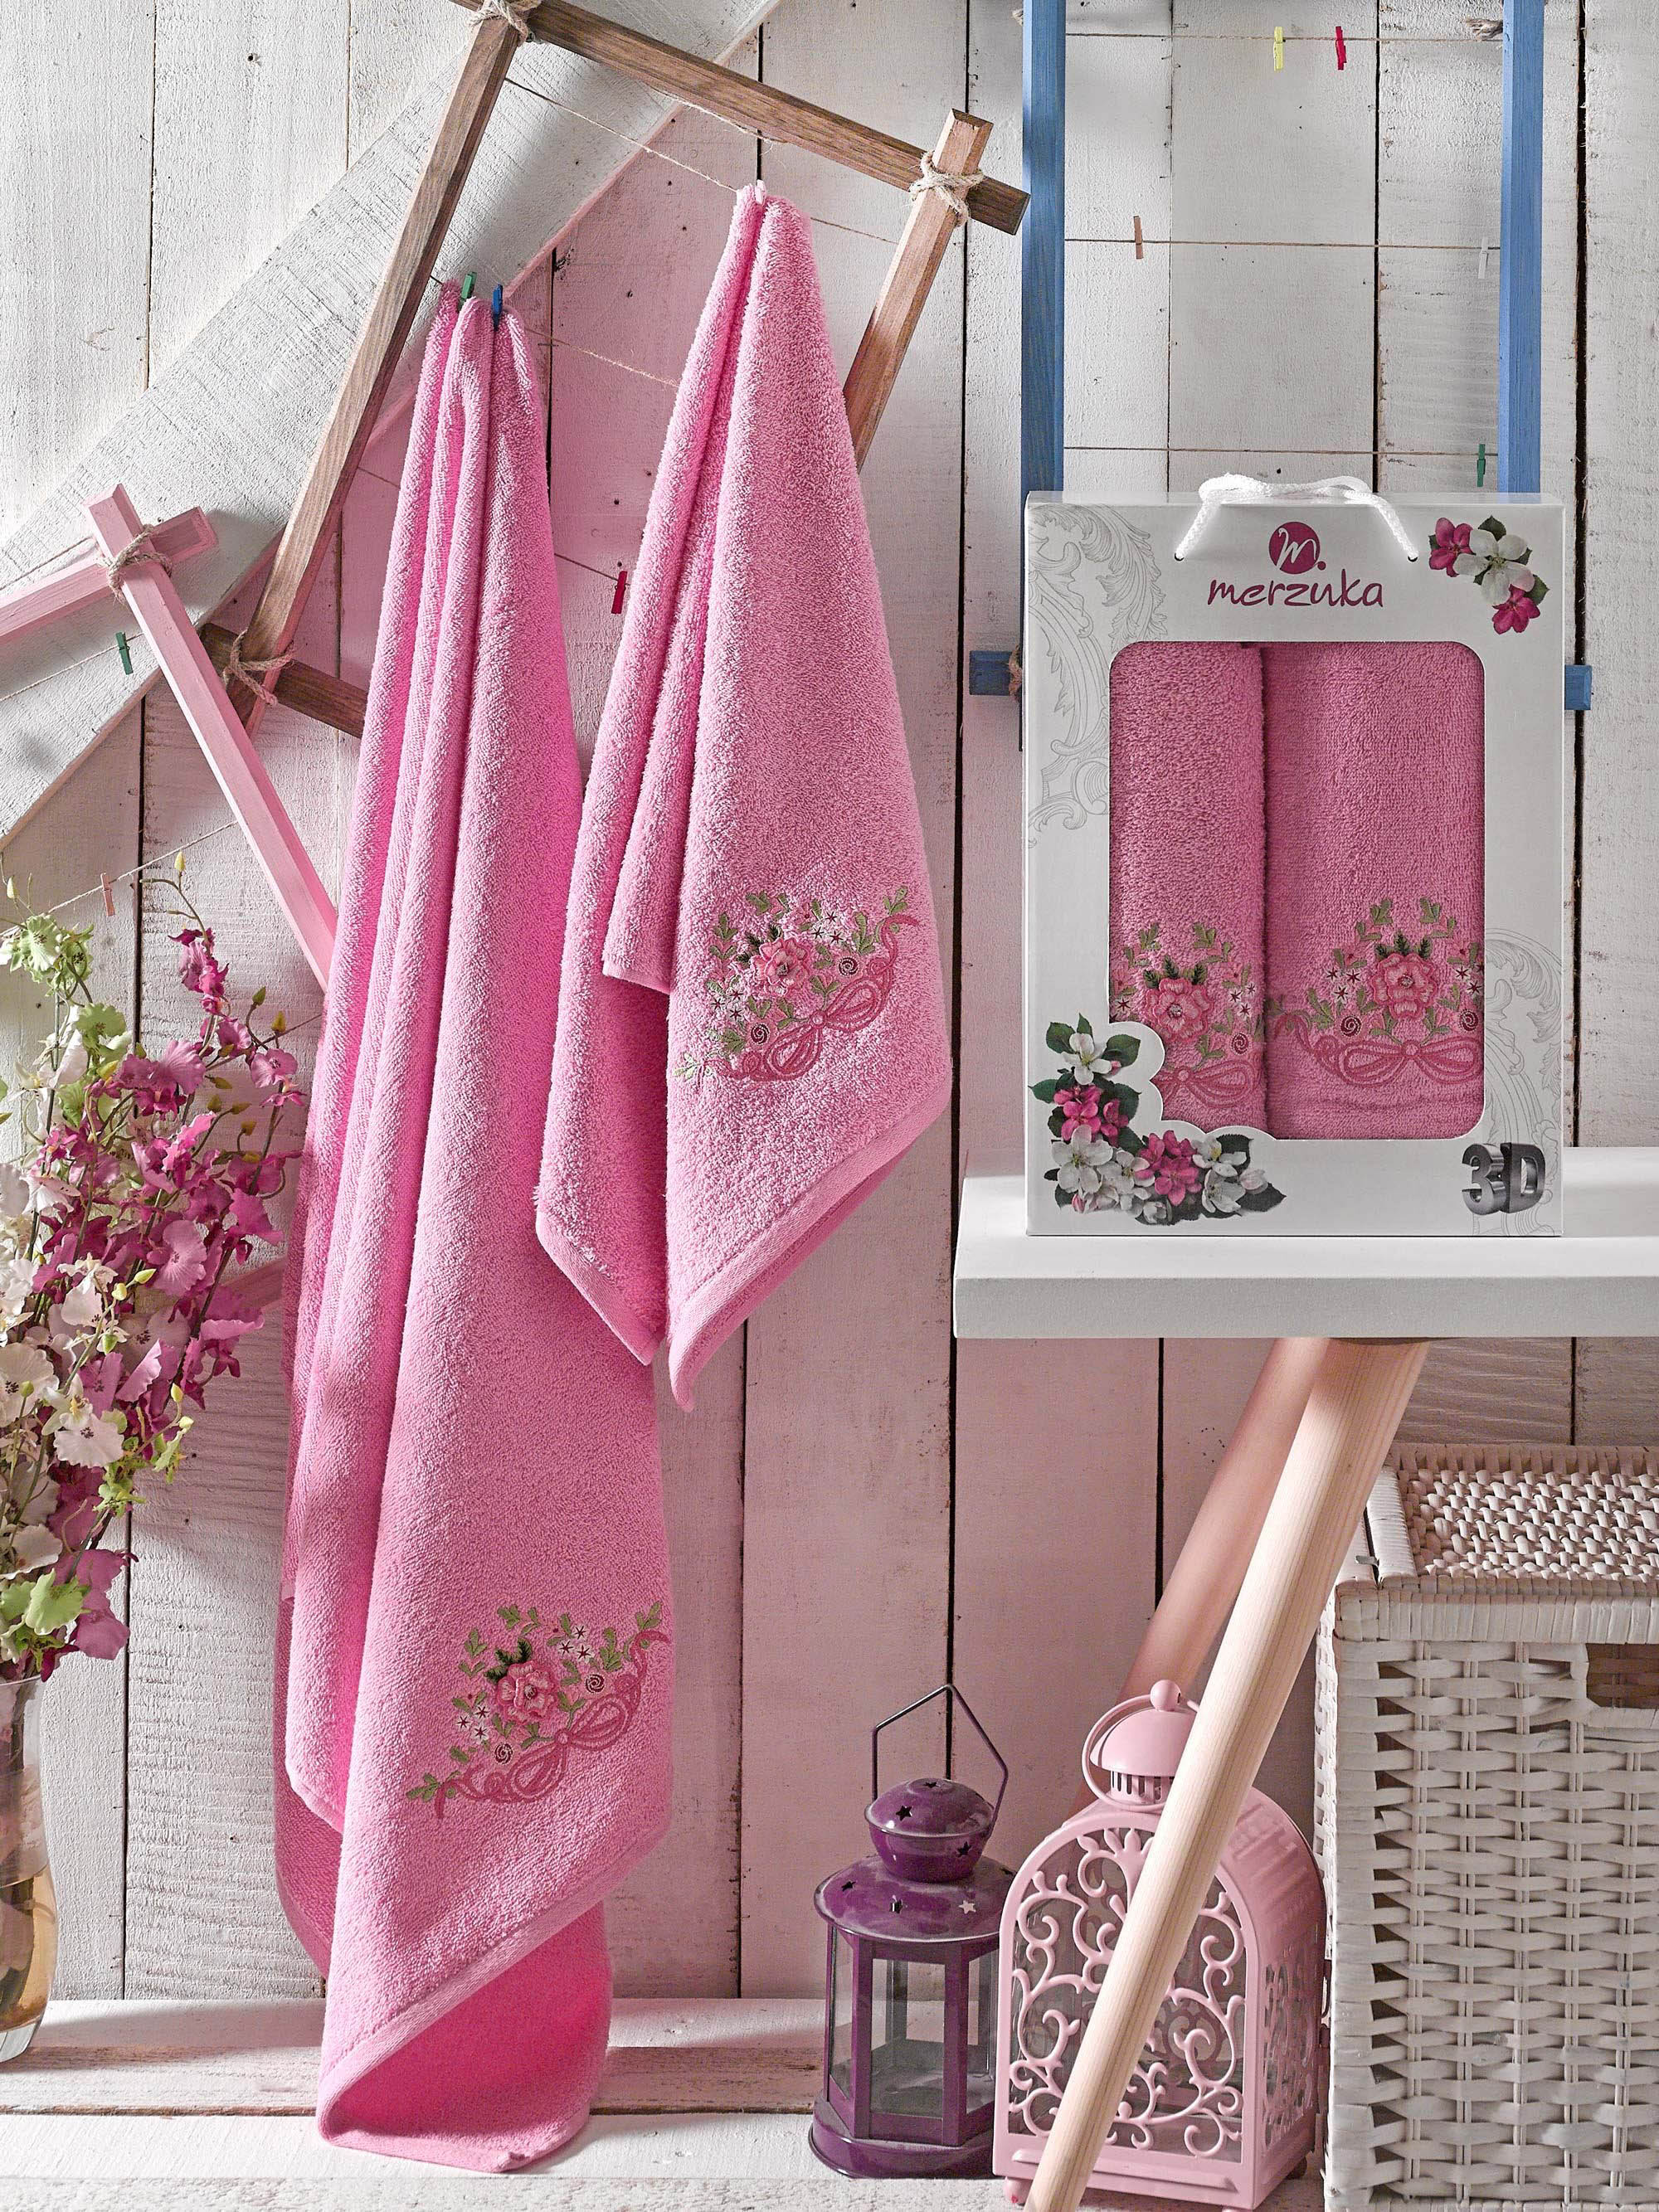 Полотенца Oran Merzuka Полотенце Demo Цвет: Розовый (50х90 см,70х140 см) набор из 3 полотенец merzuka sakura 50х90 2 70х140 8432 оранжевый